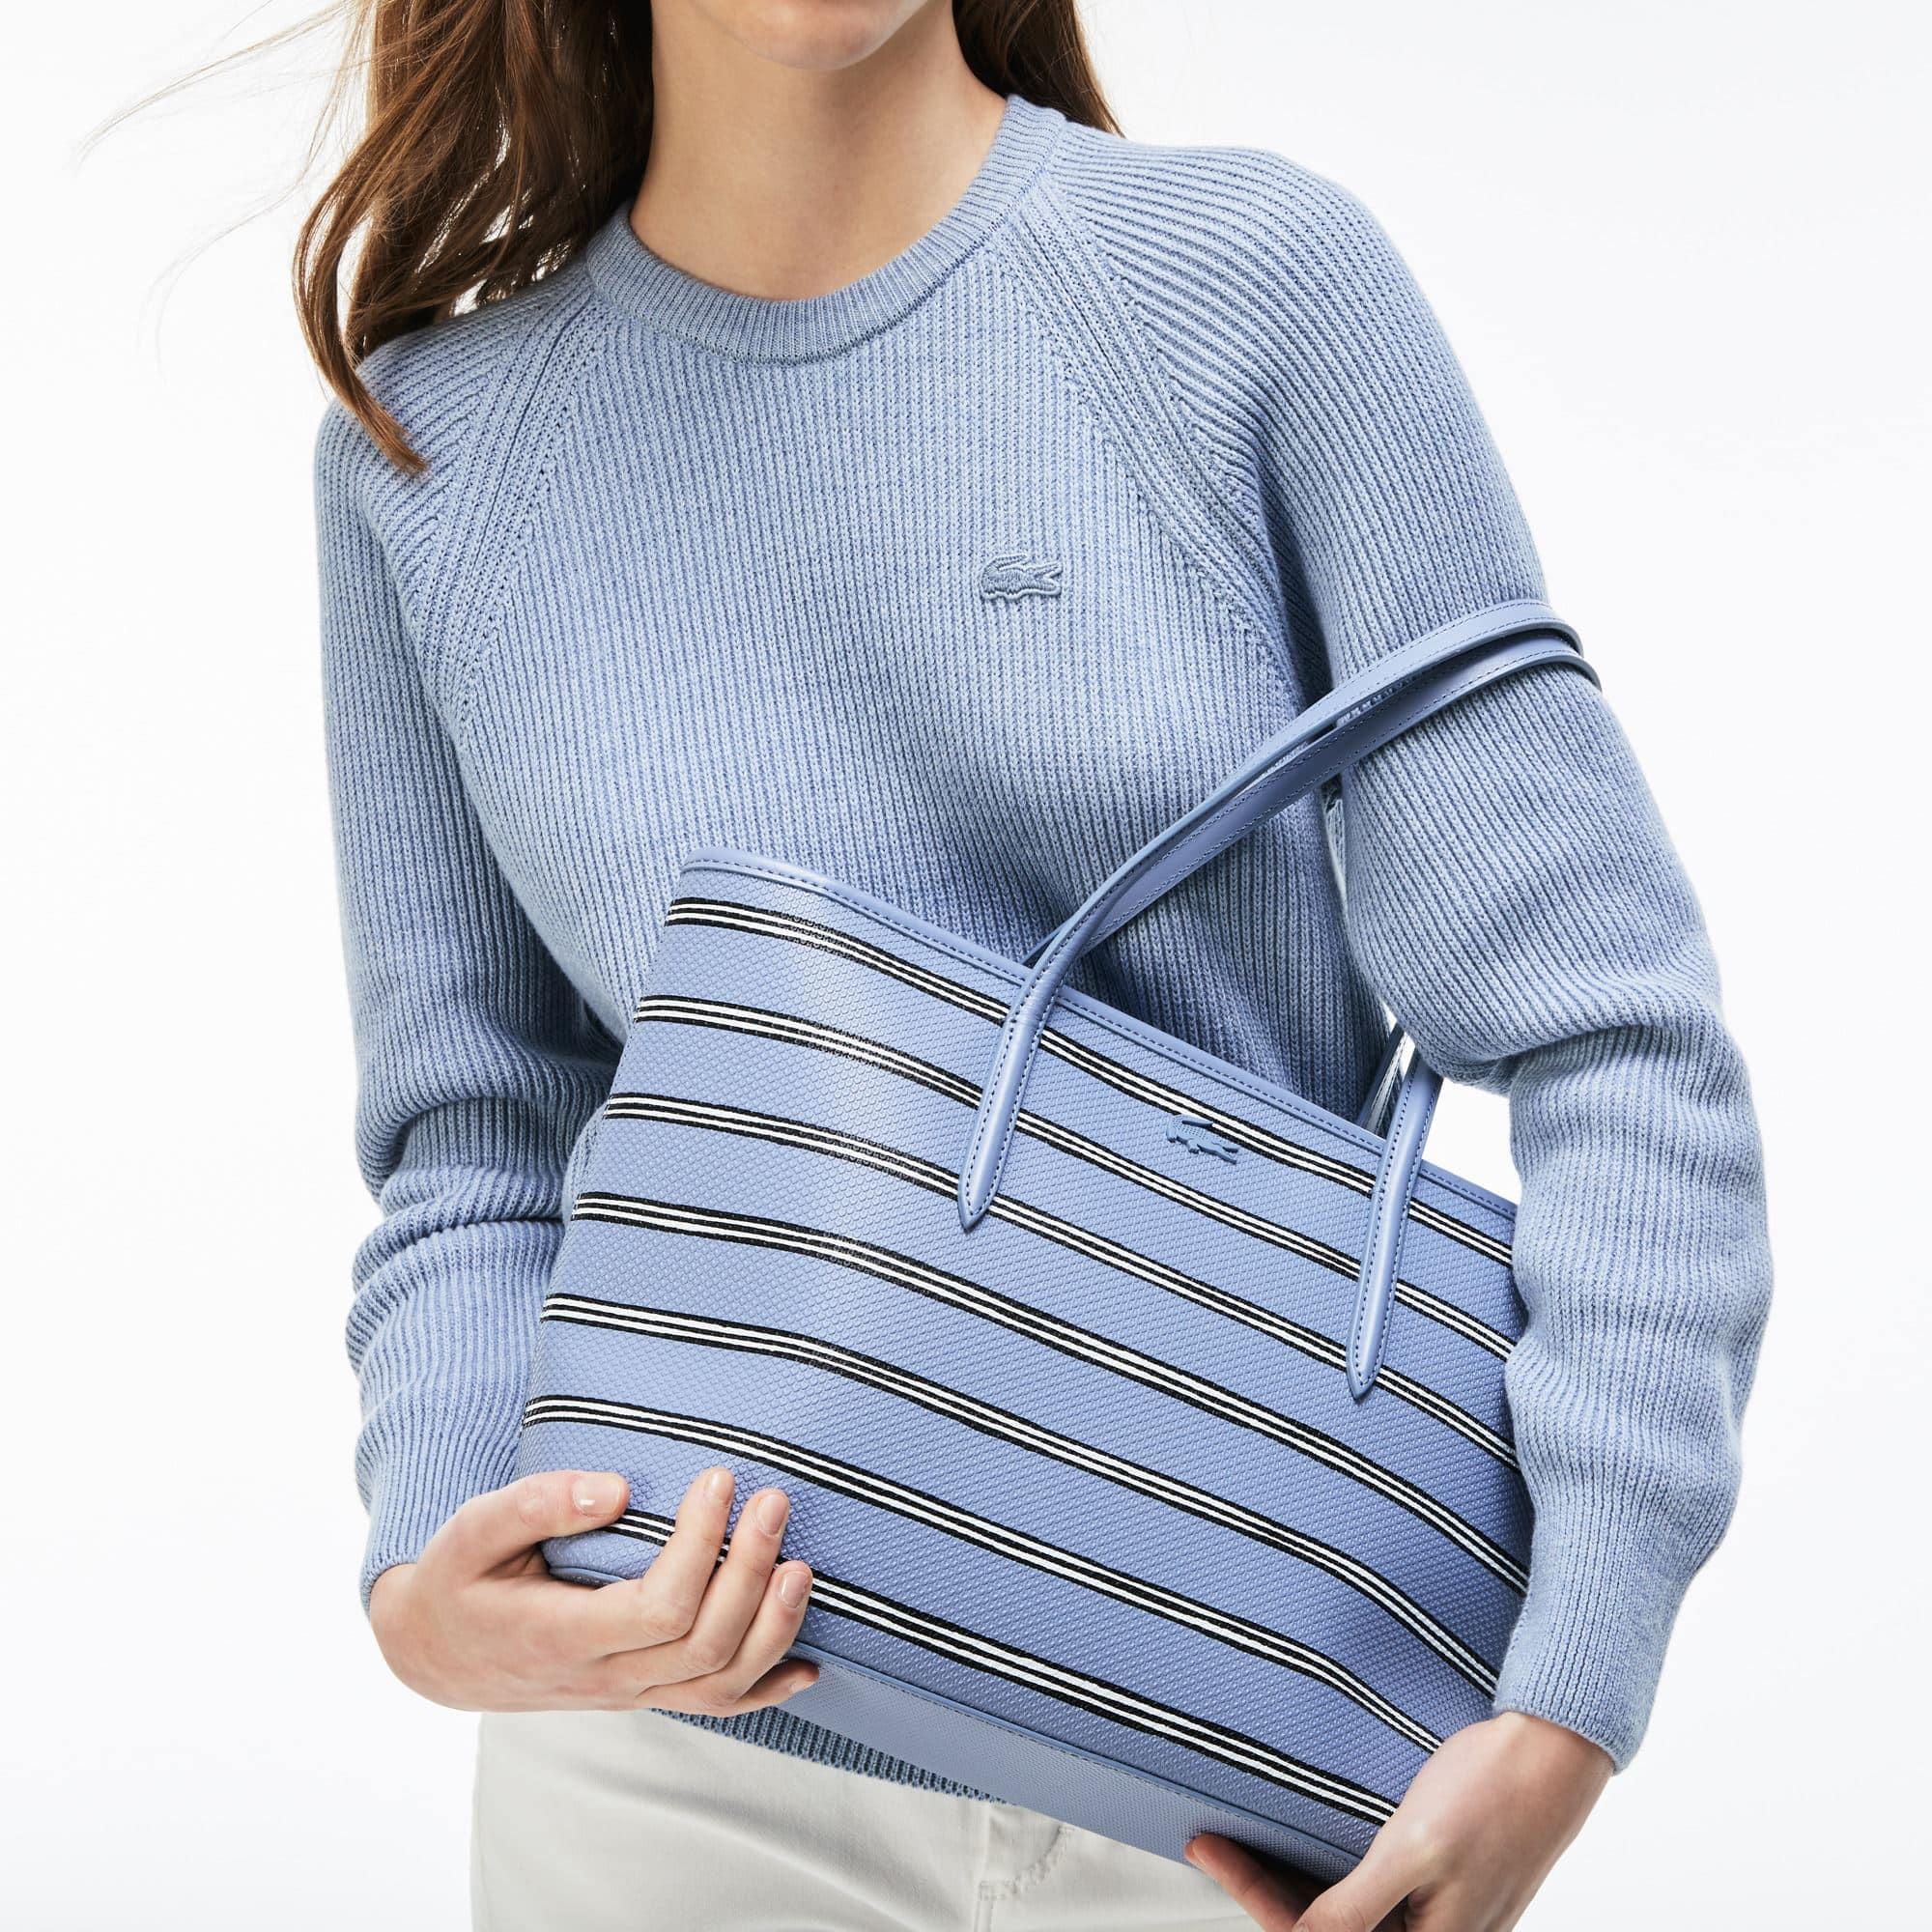 Women's Chantaco Striped Print Piqué Leather Zip Tote Bag